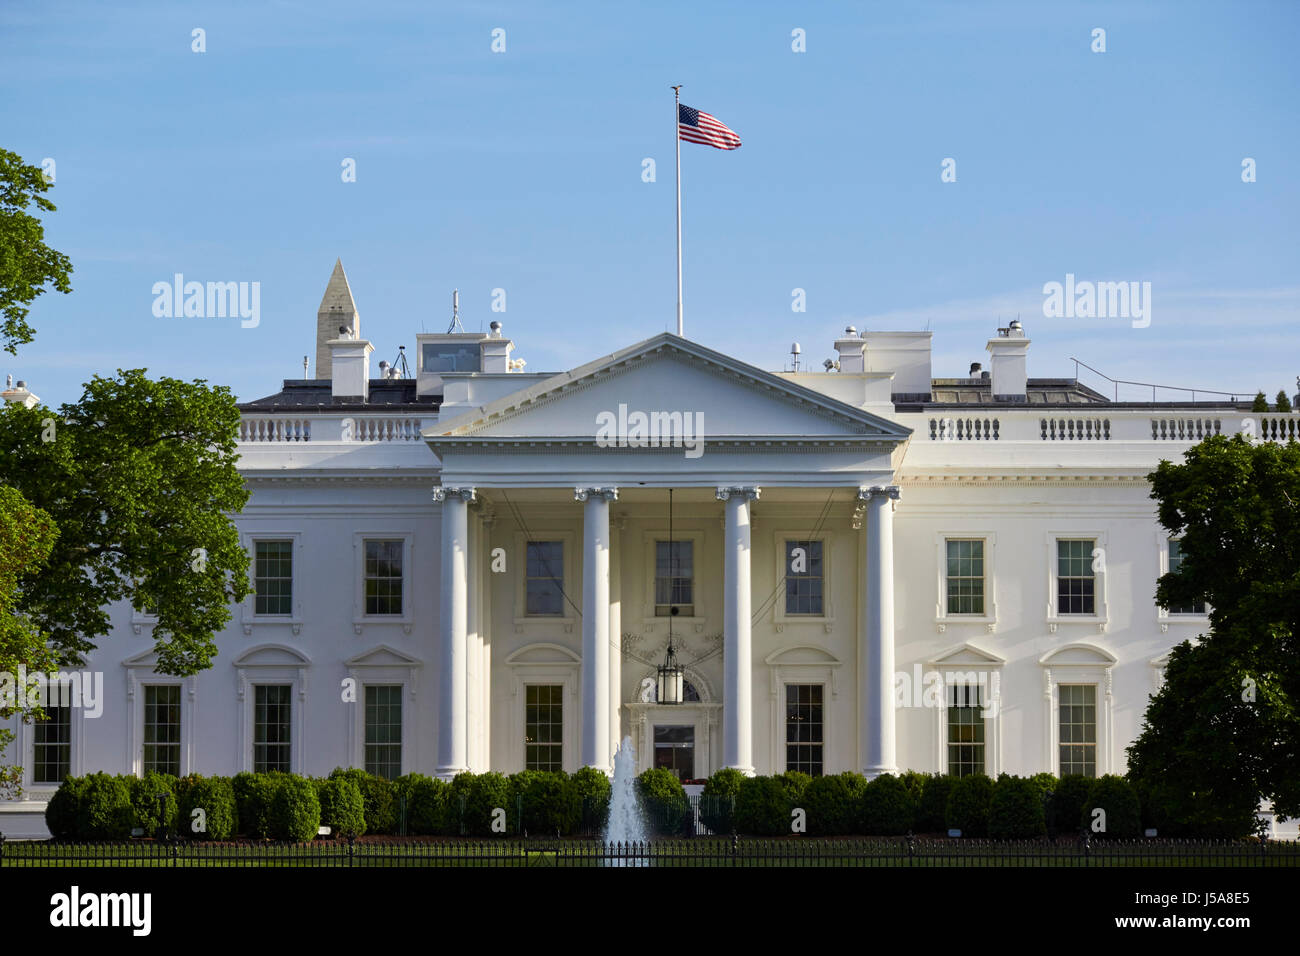 northern facade of the white house Washington DC USA - Stock Image